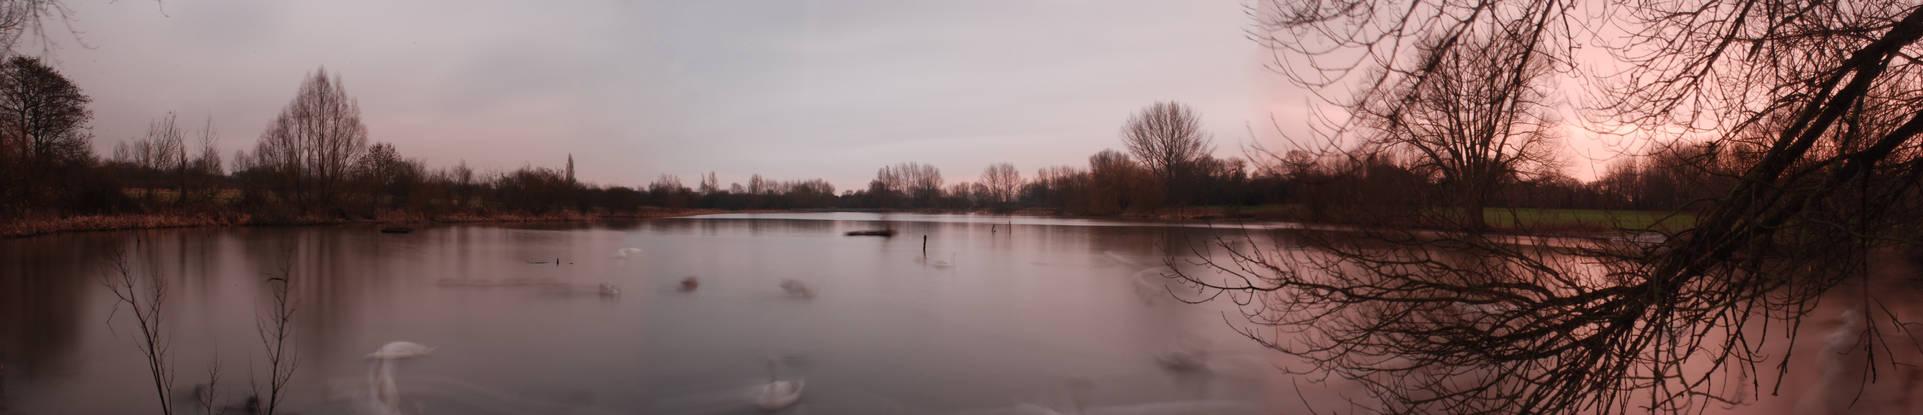 STRIKING SUNLIGHT - Wyken Slough, West Midlands